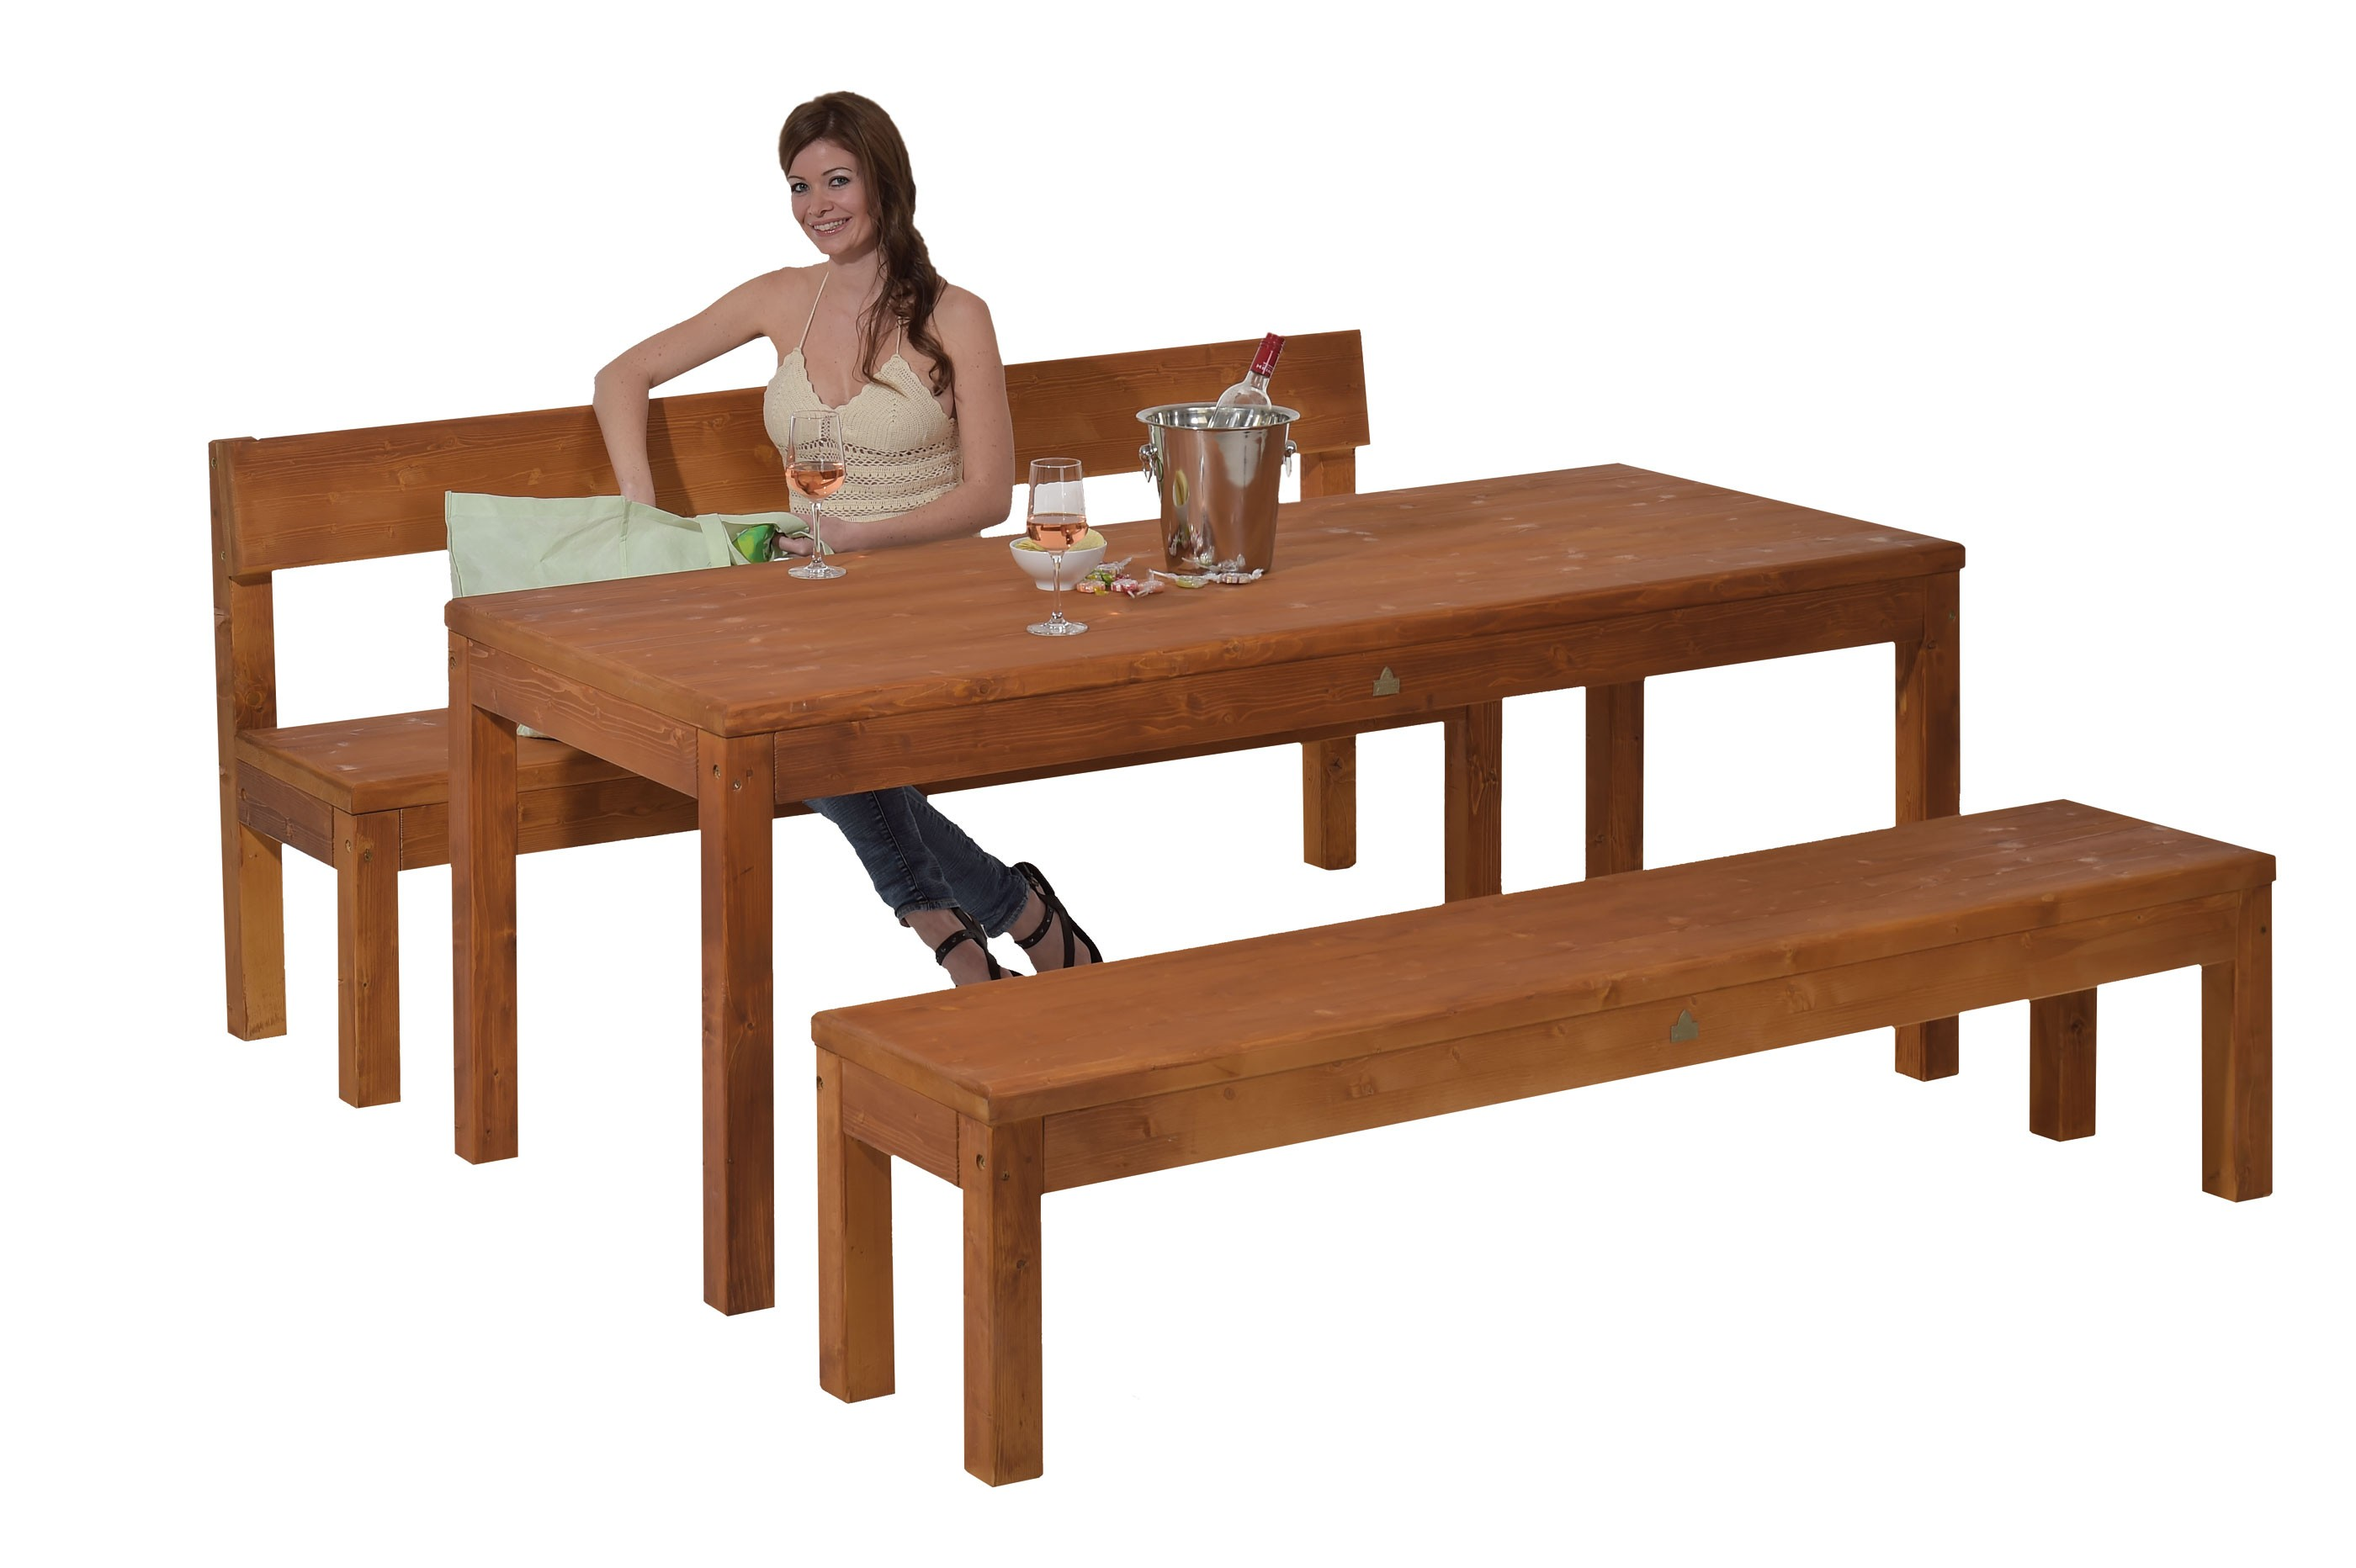 gartenbank graz impr gniert 150cm bei. Black Bedroom Furniture Sets. Home Design Ideas